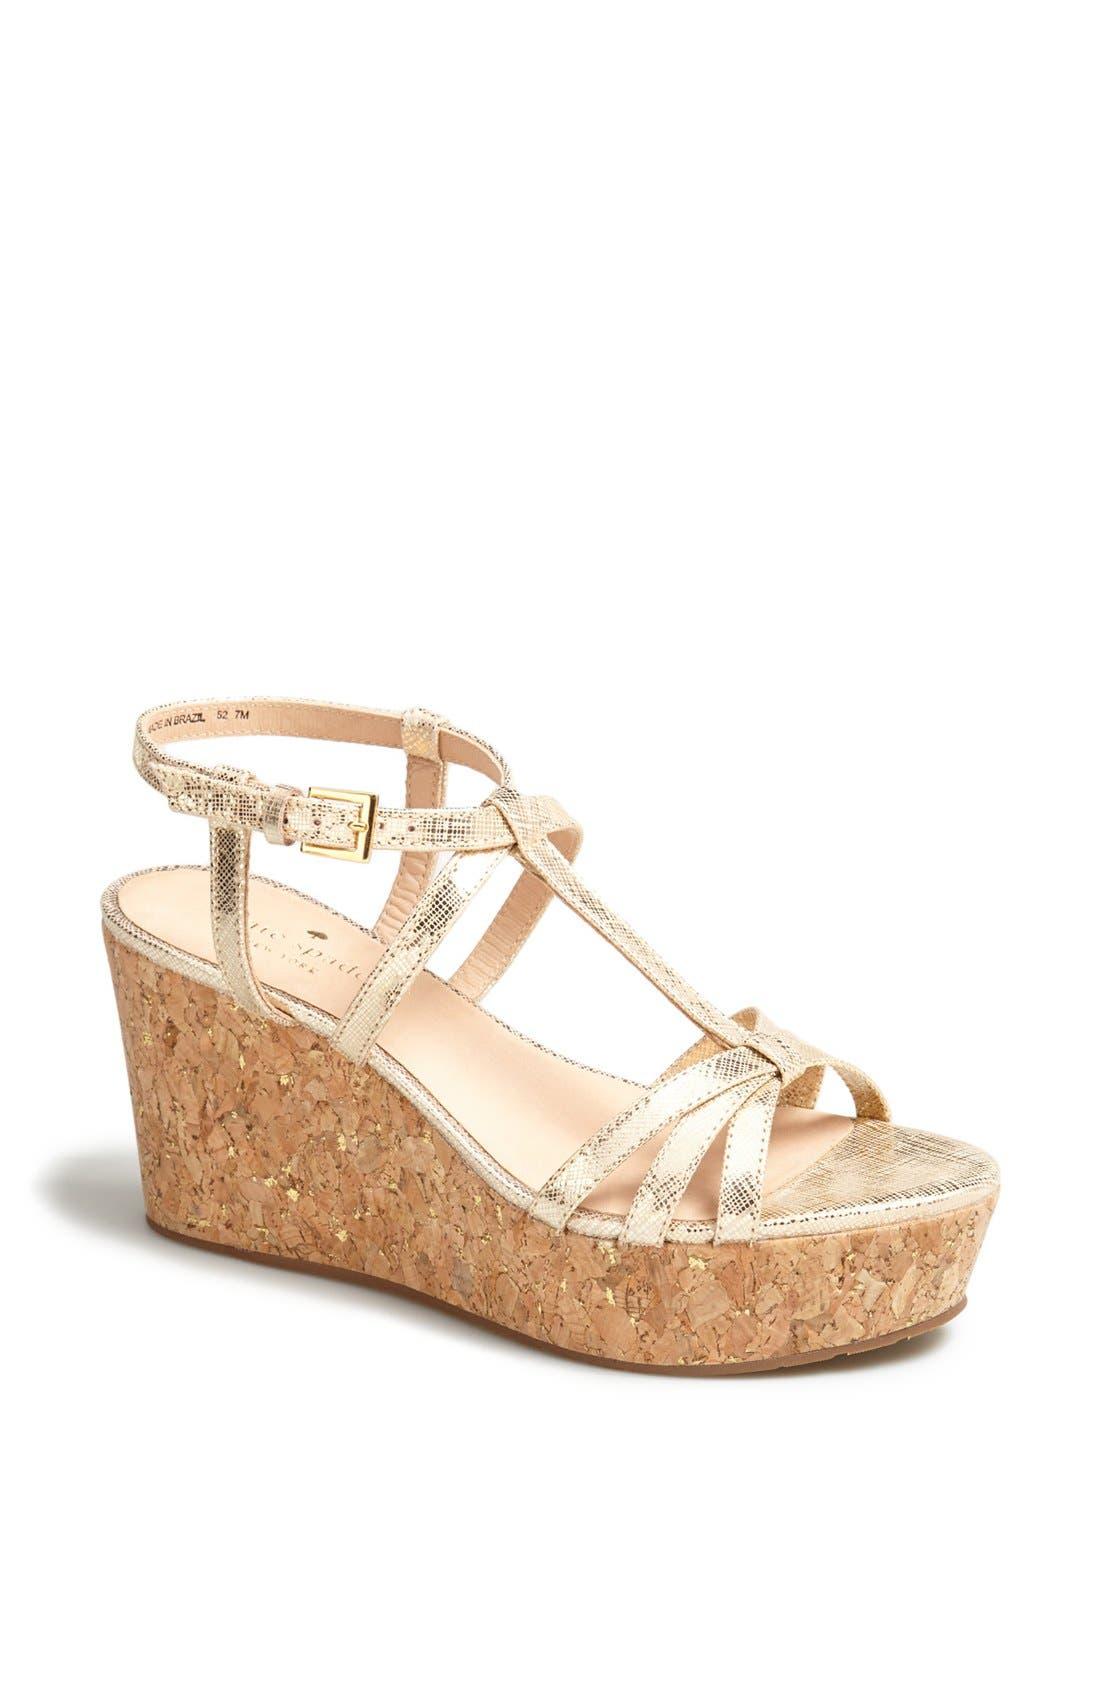 Alternate Image 1 Selected - kate spade new york 'tropez' wedge platform sandal